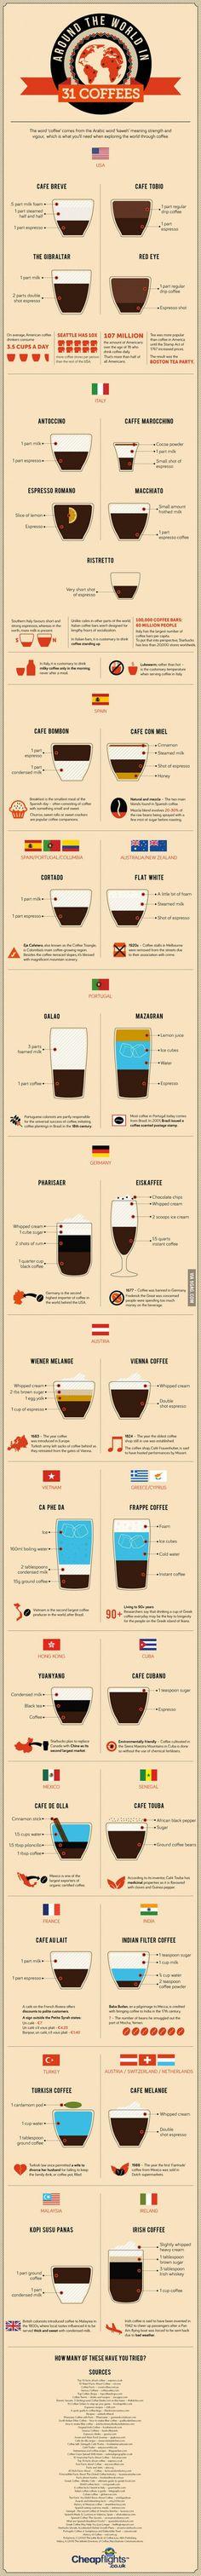 31 coffees around the world.